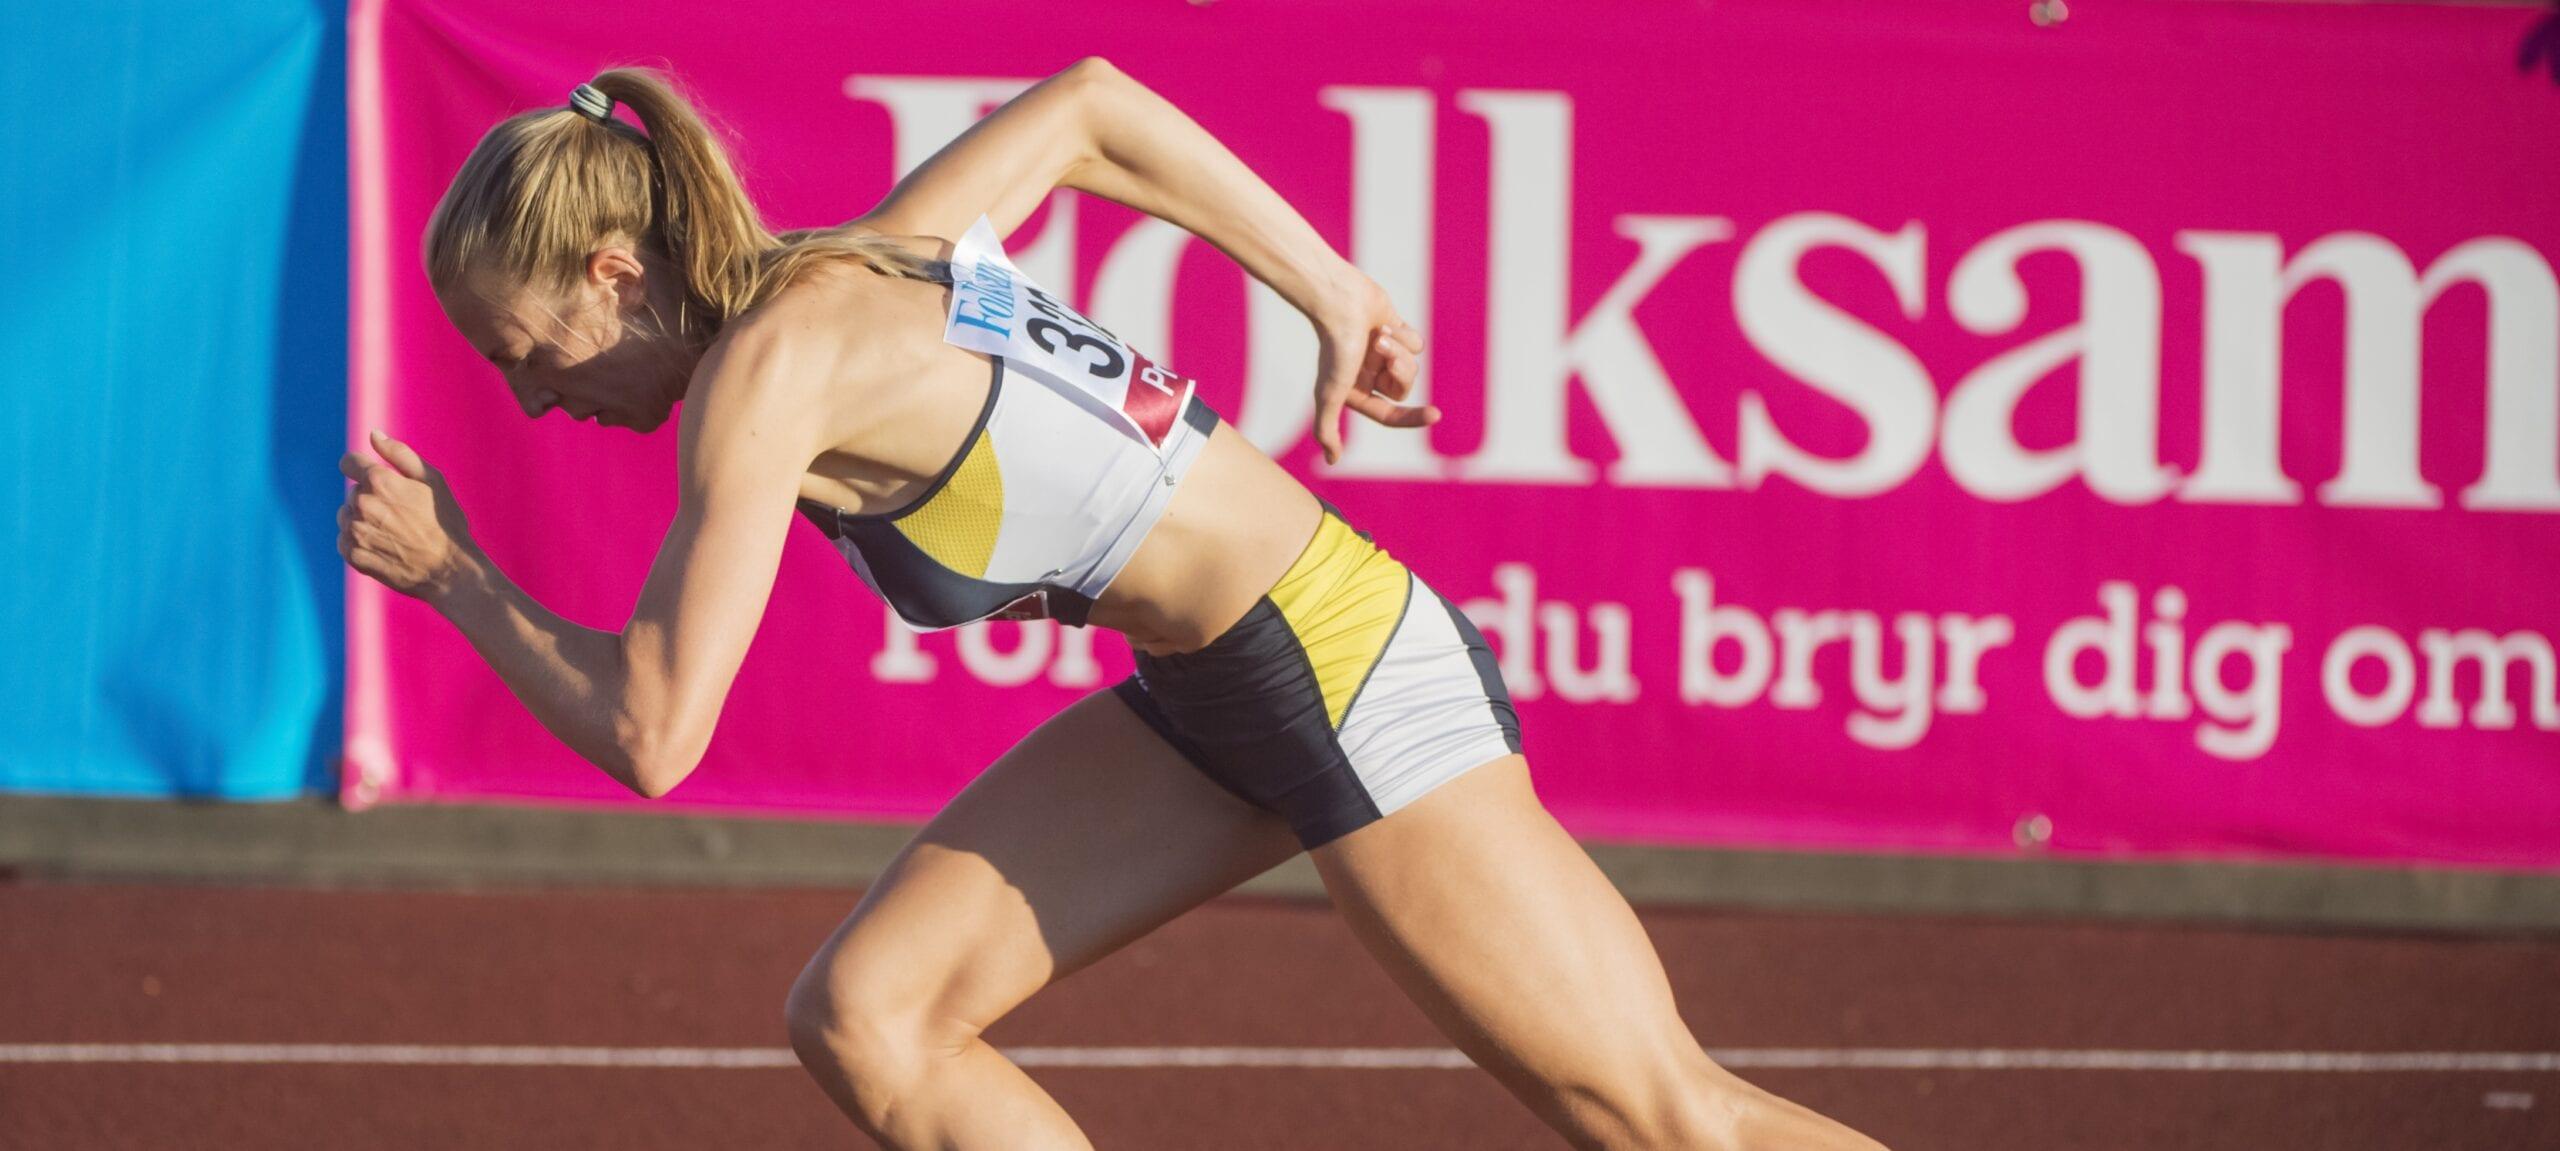 Folksam - Swedish Athletics Association partnership - March 2021